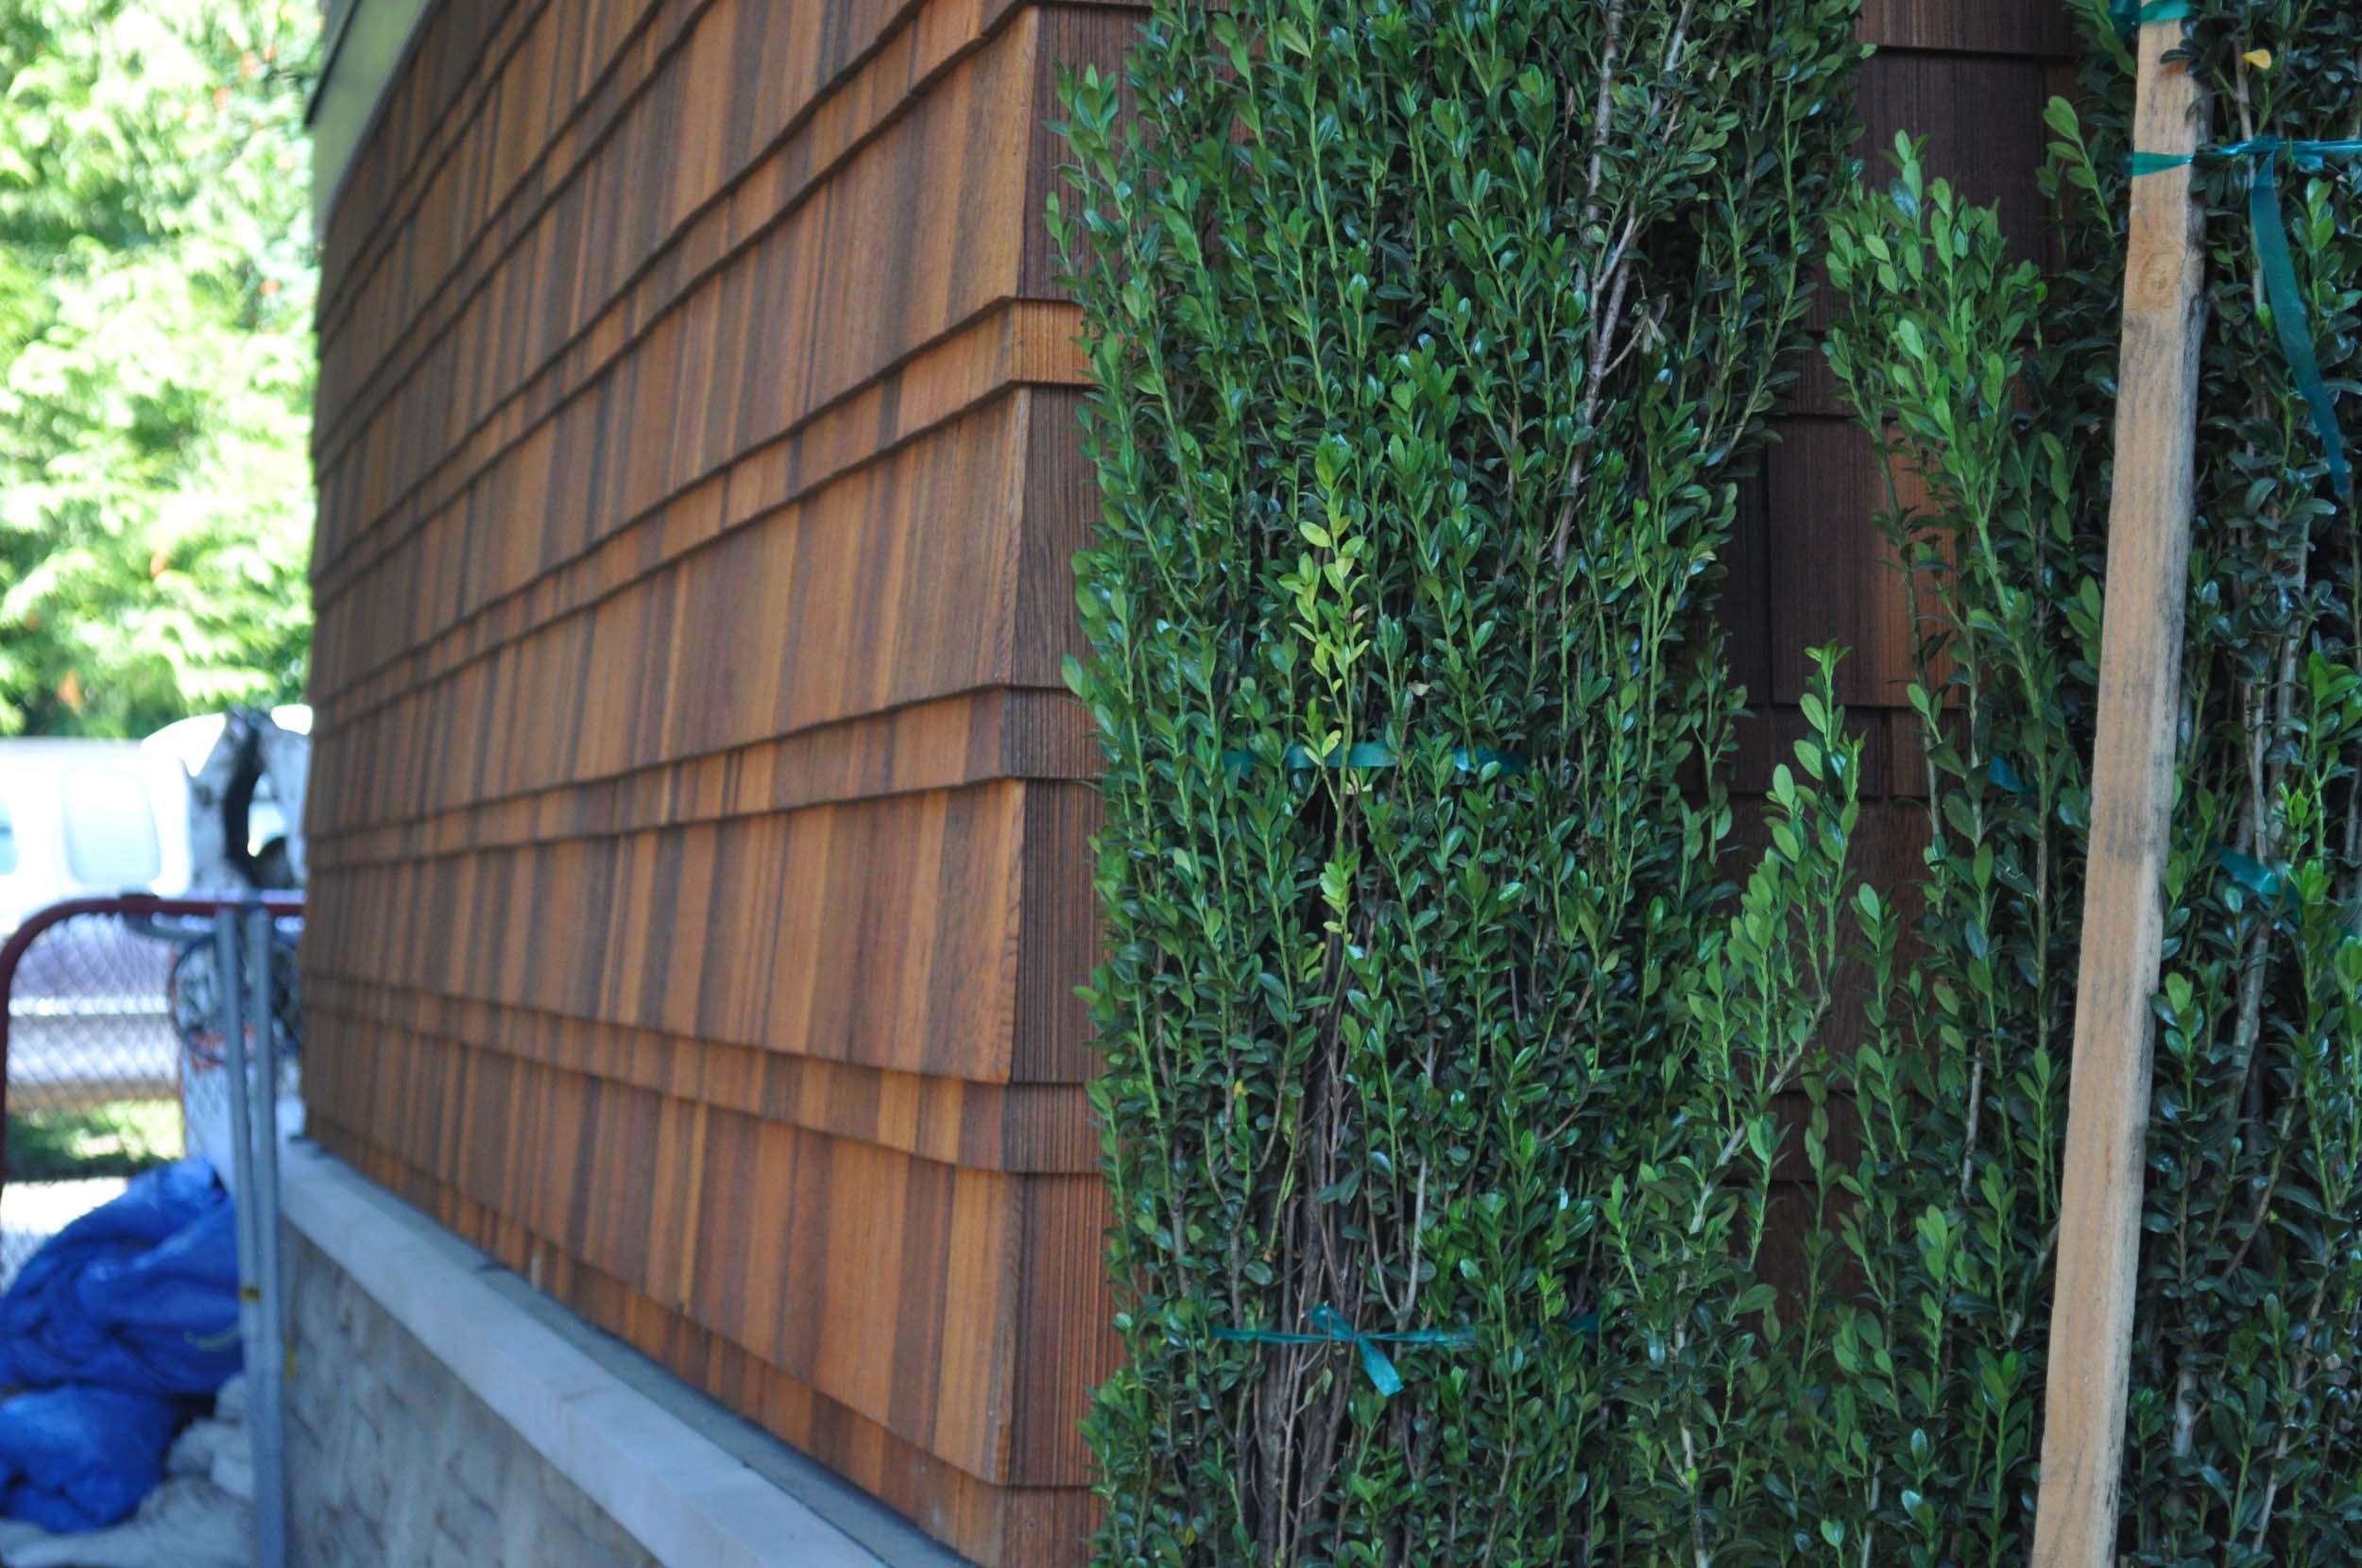 Postle_Construction_ExteriorCladding19.jpg